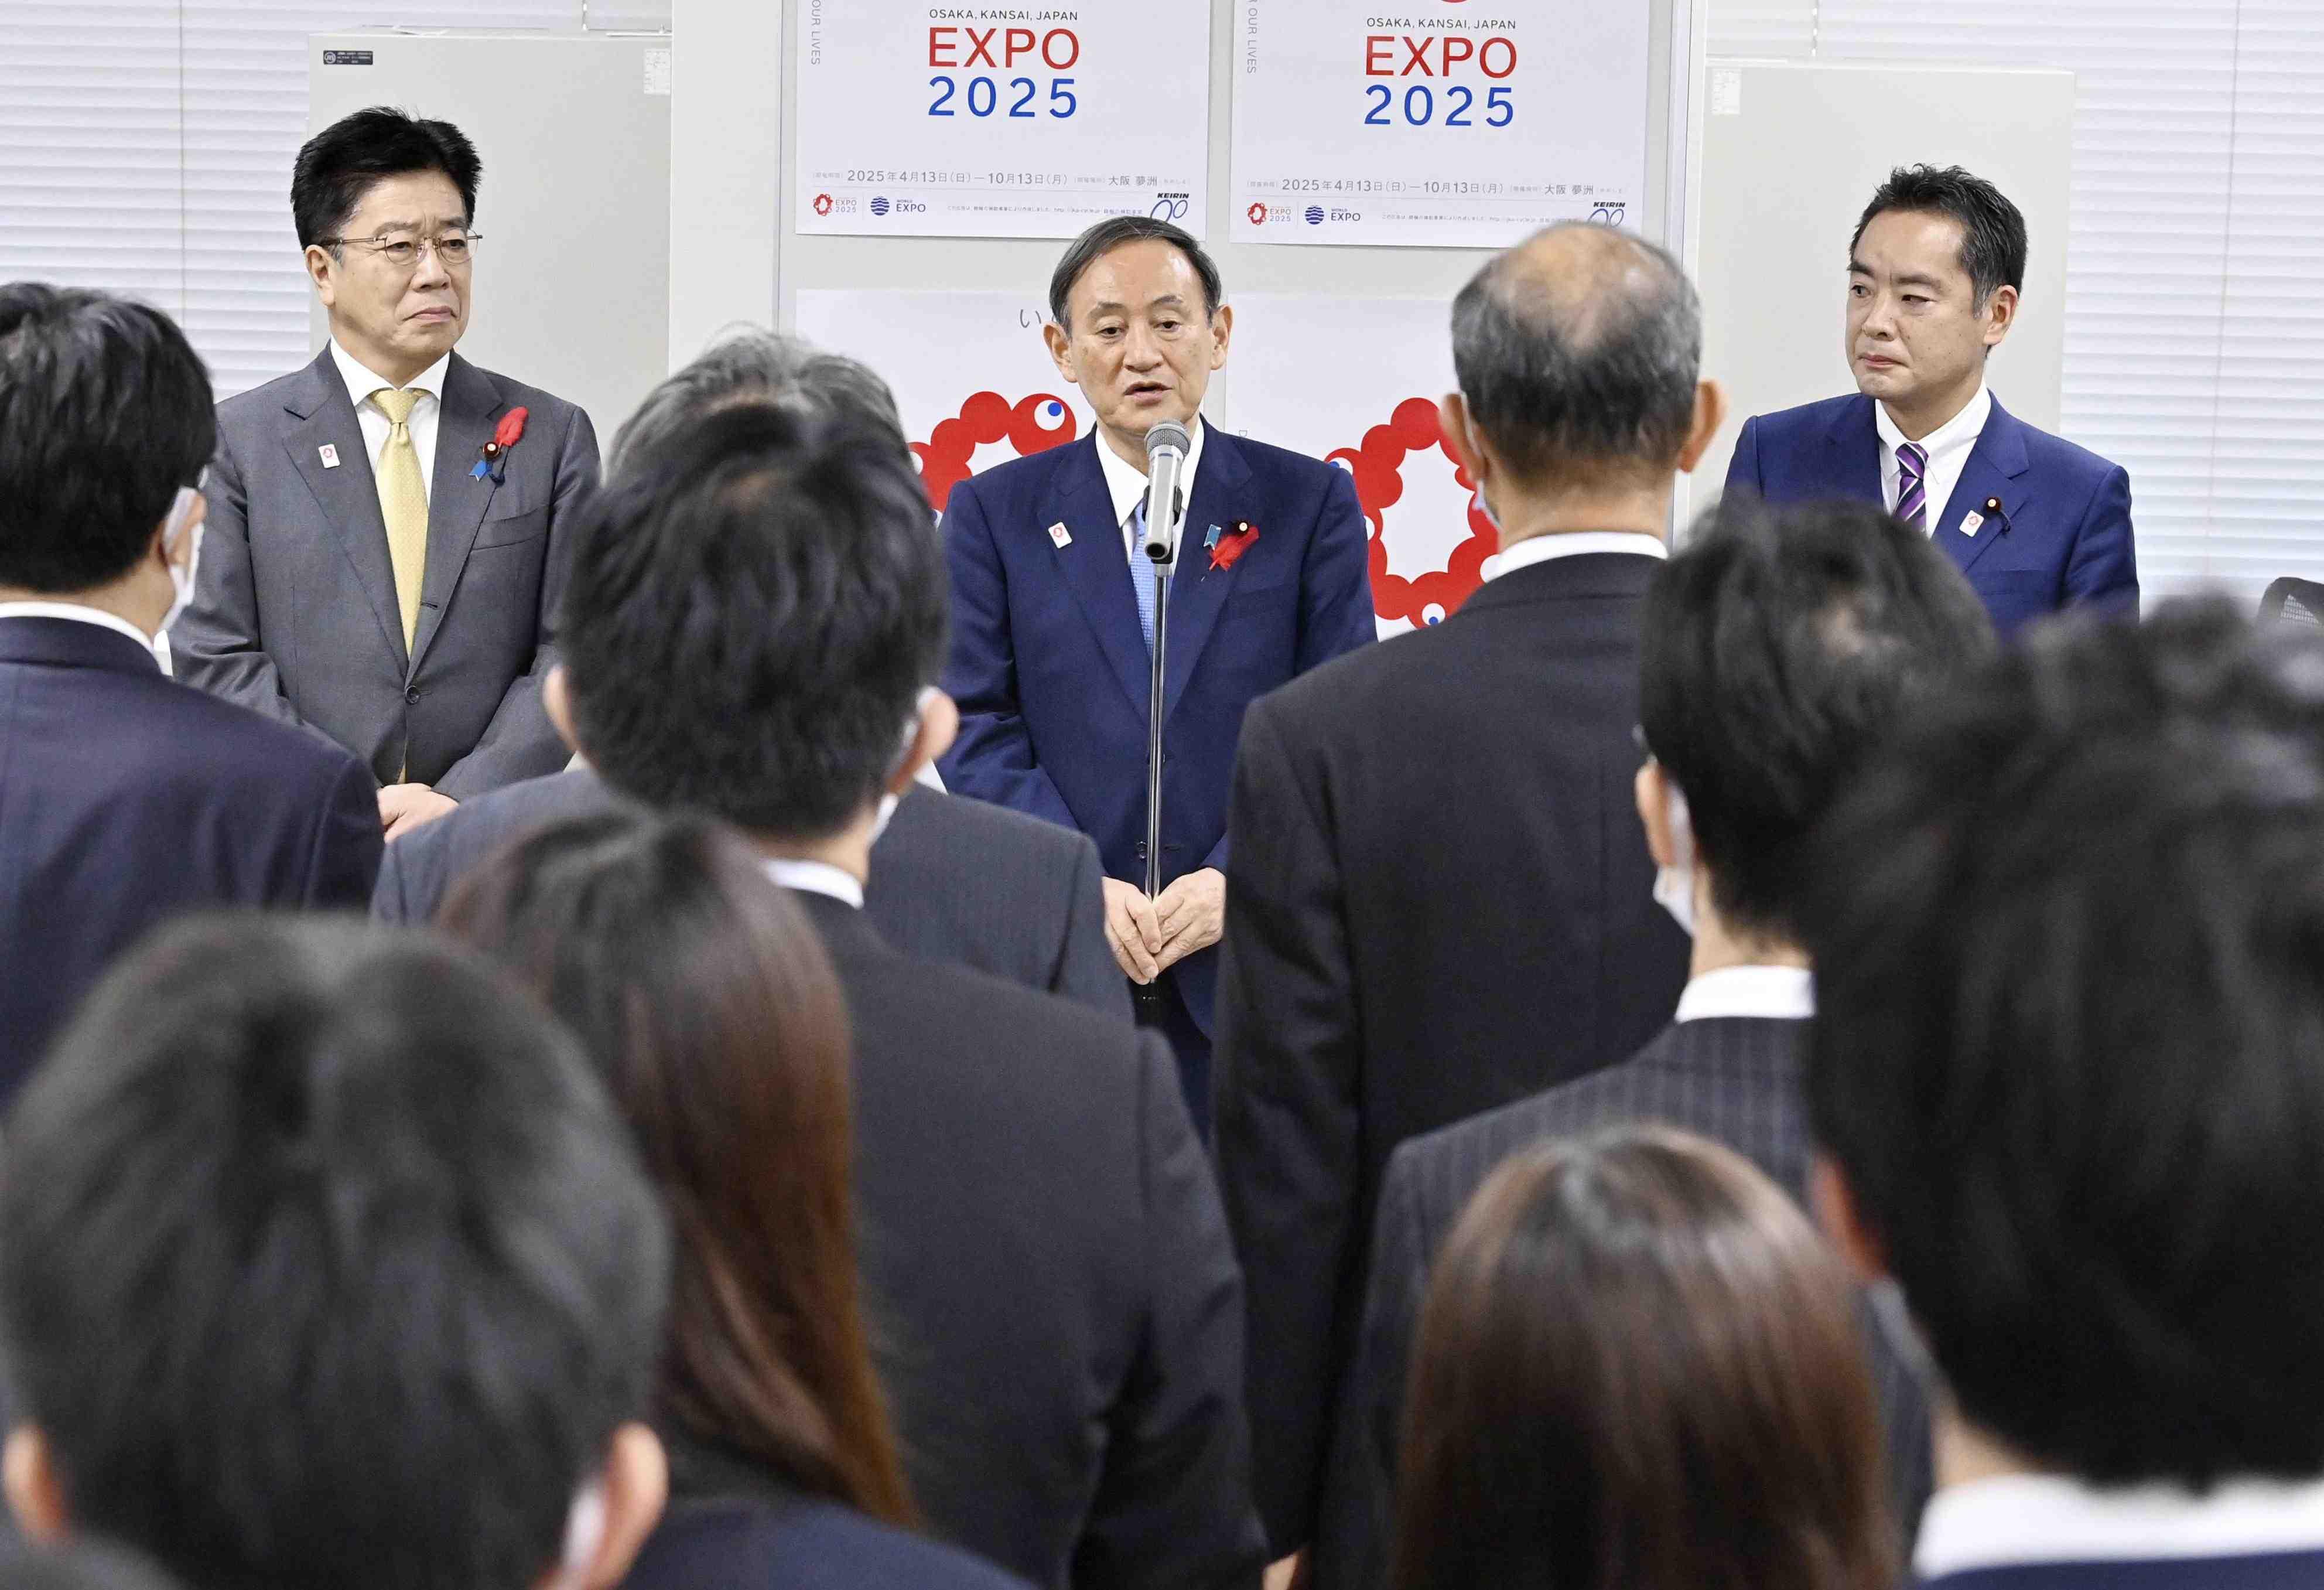 Japan-Expo-Minister-Shinji-Inoue-on-Post-Corona-expo-017